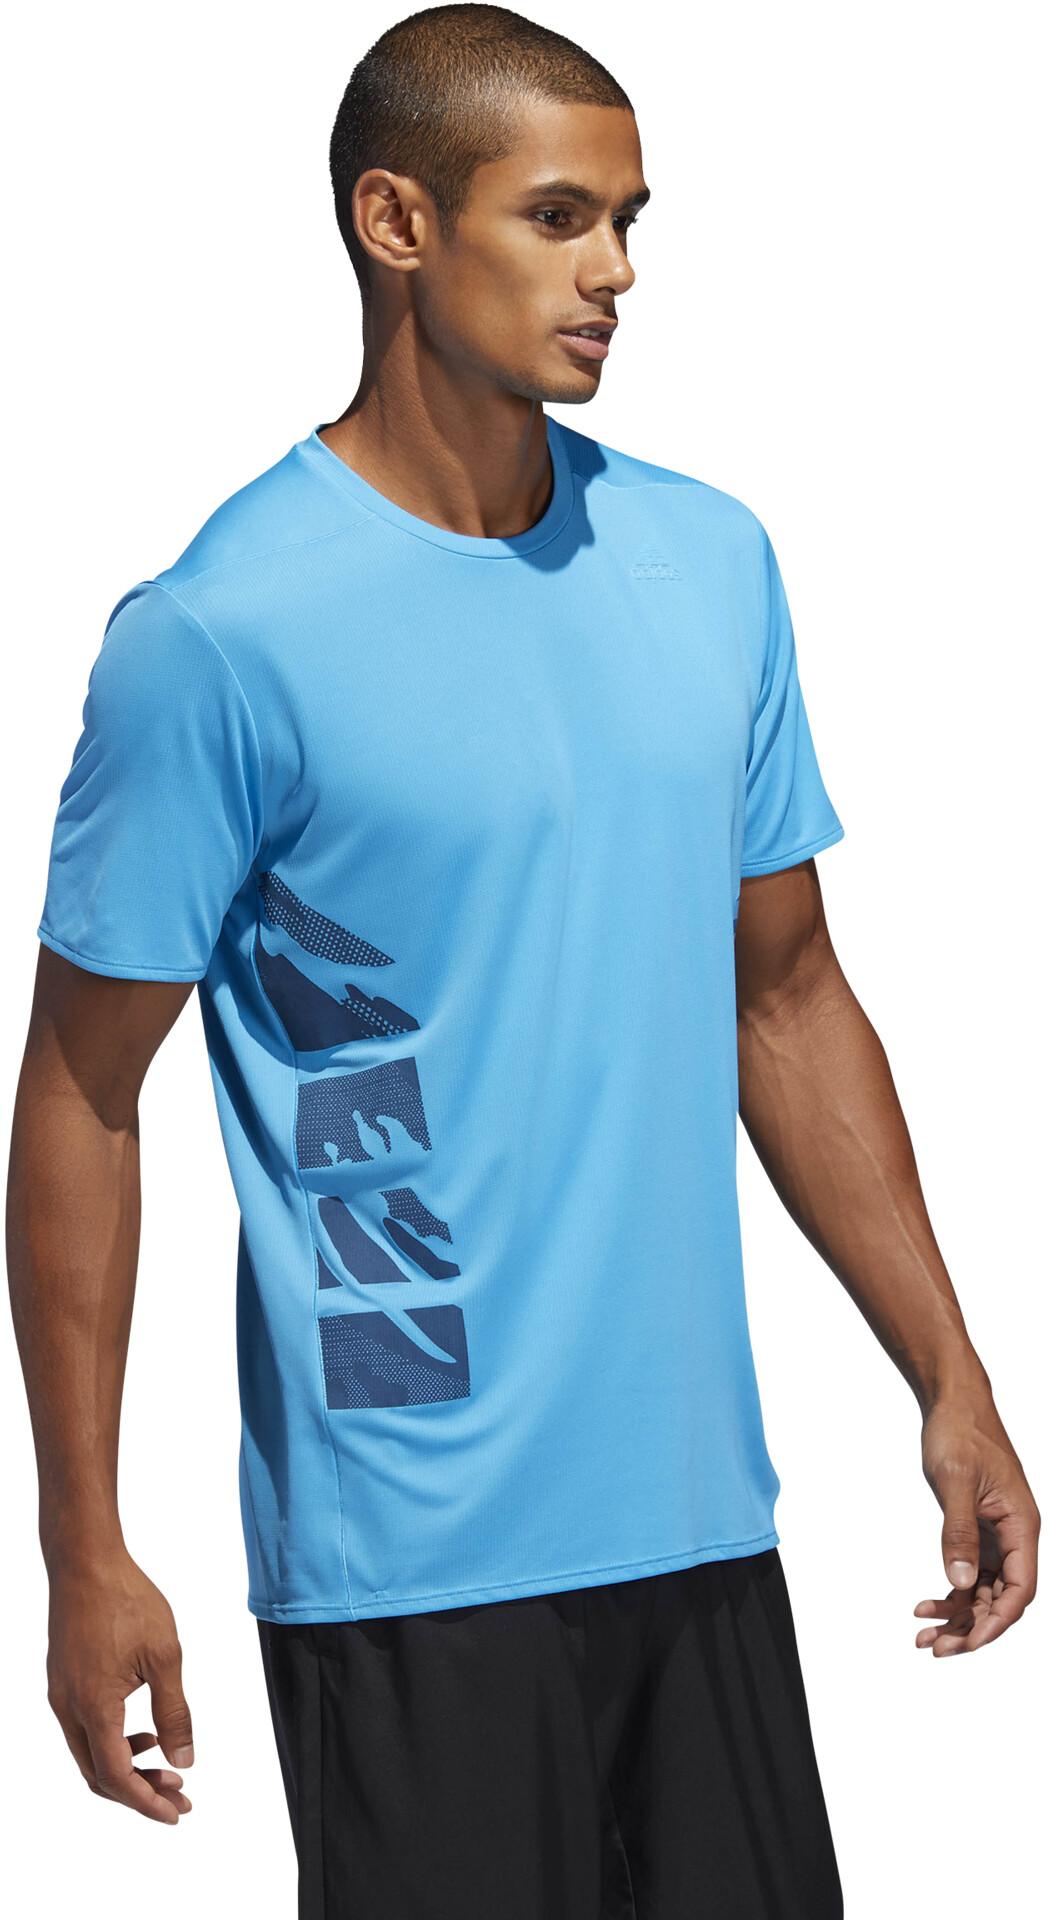 61e9714eb adidas Supernova Running T-shirt Men blue at Addnature.co.uk